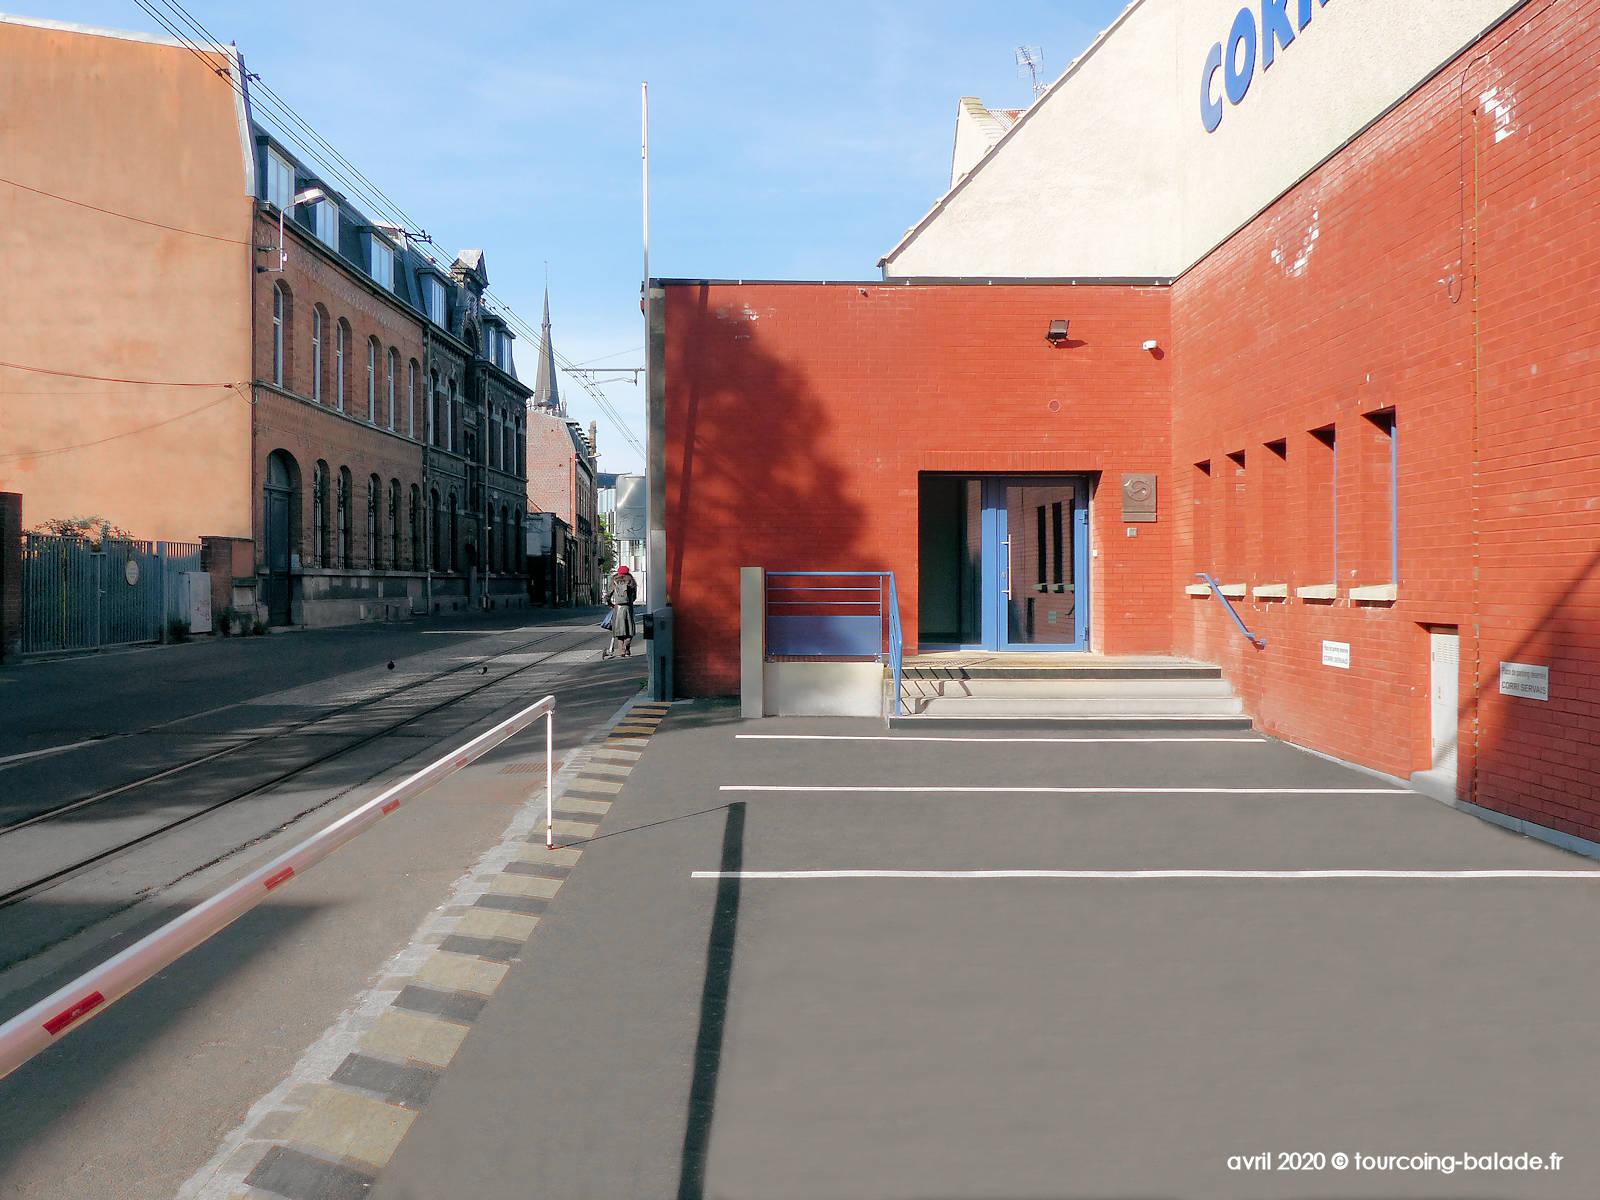 Rue Chanzy, Ateliers Corri-Servais, Tourcoing 2020